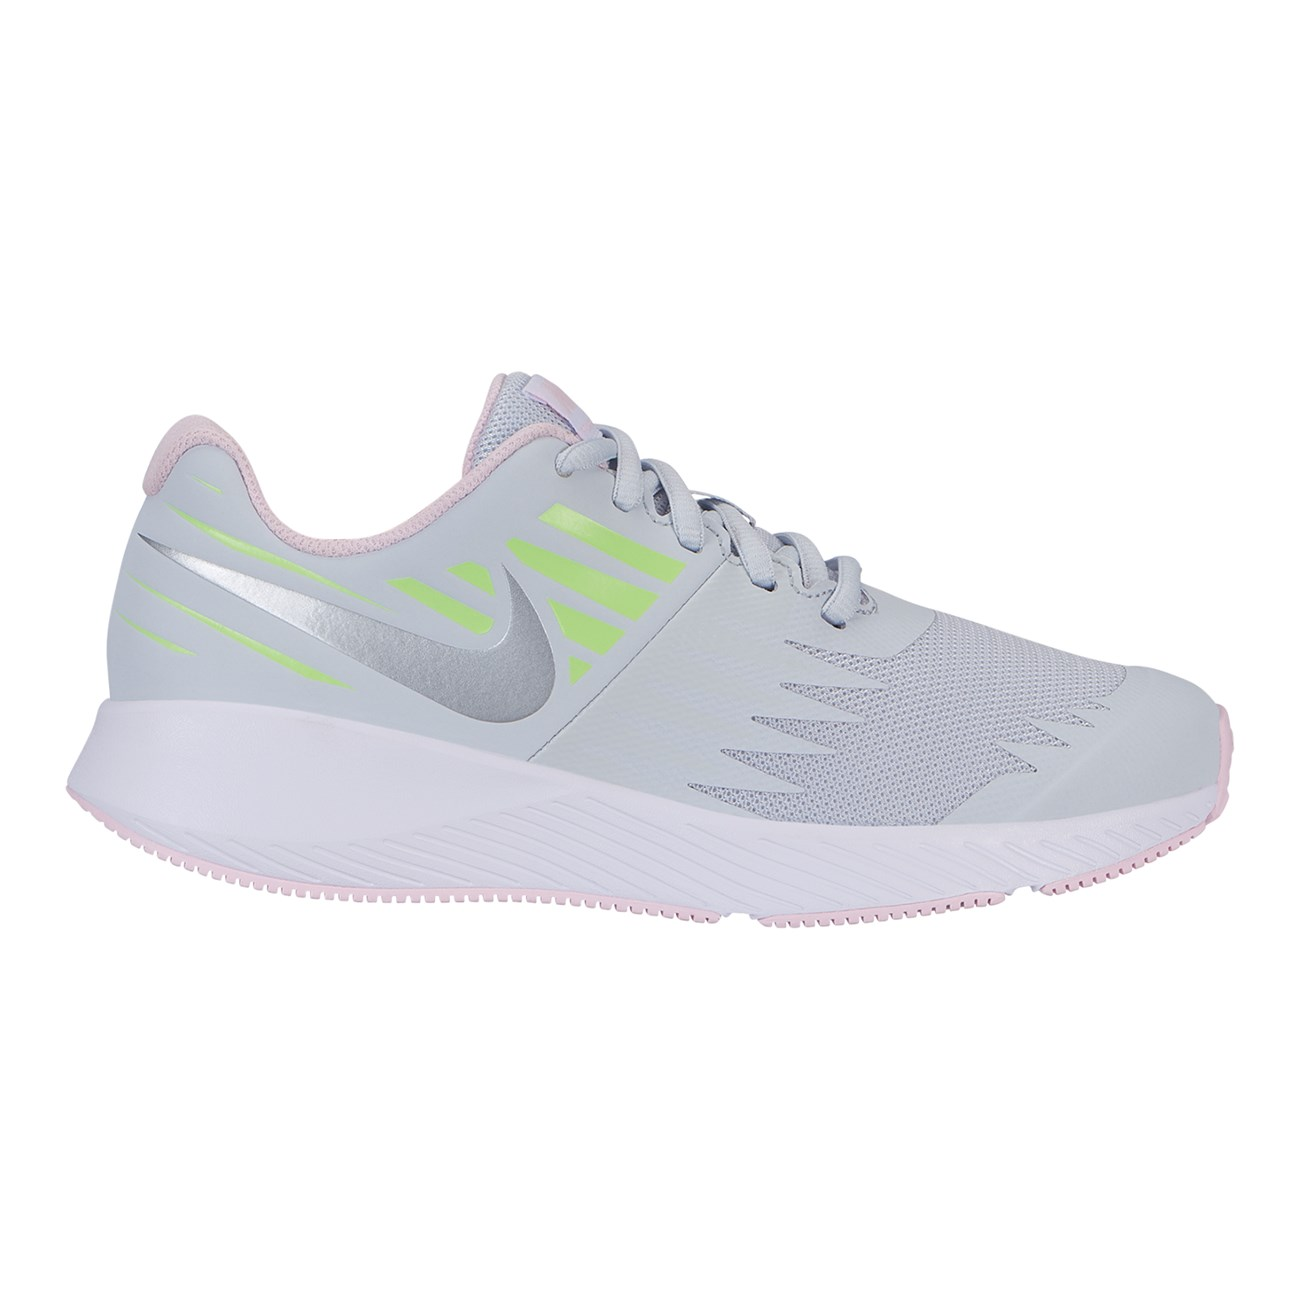 NIKE STAR RUNNER GS   Παπούτσια για Τρέξιμο  d499bc45240